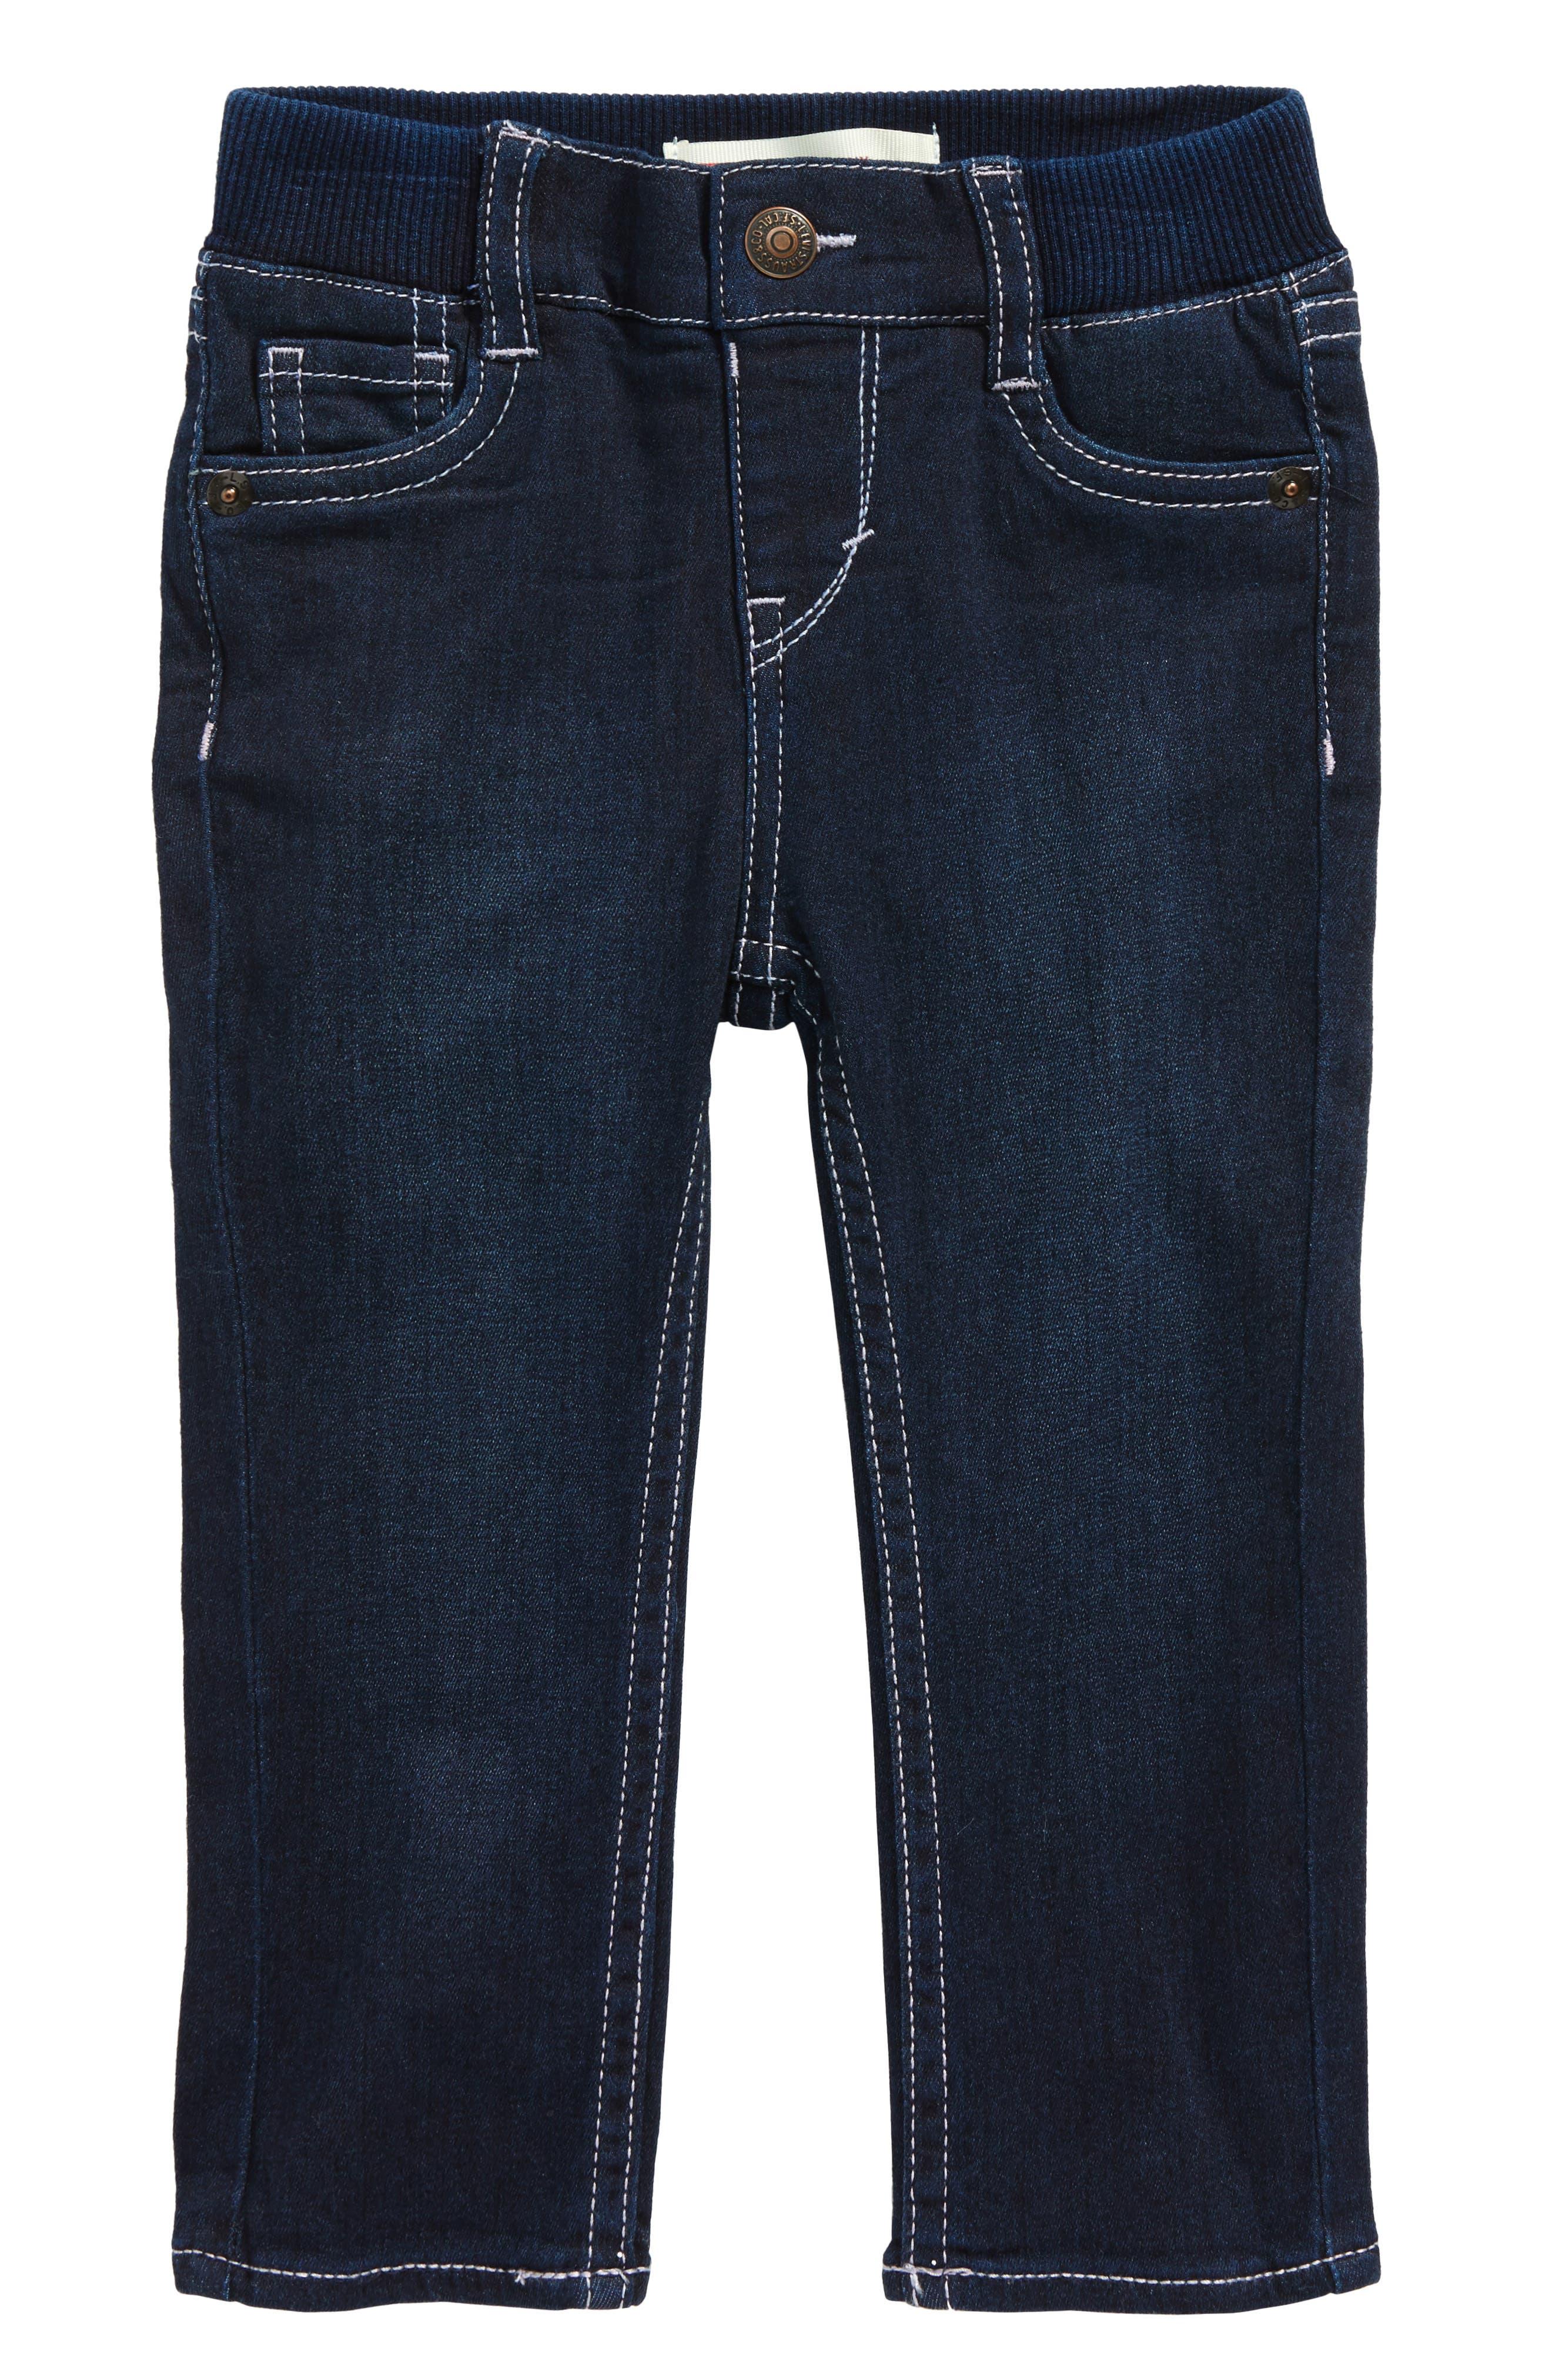 Alternate Image 1 Selected - Levi's® Skinny Jeans (Baby Girls)